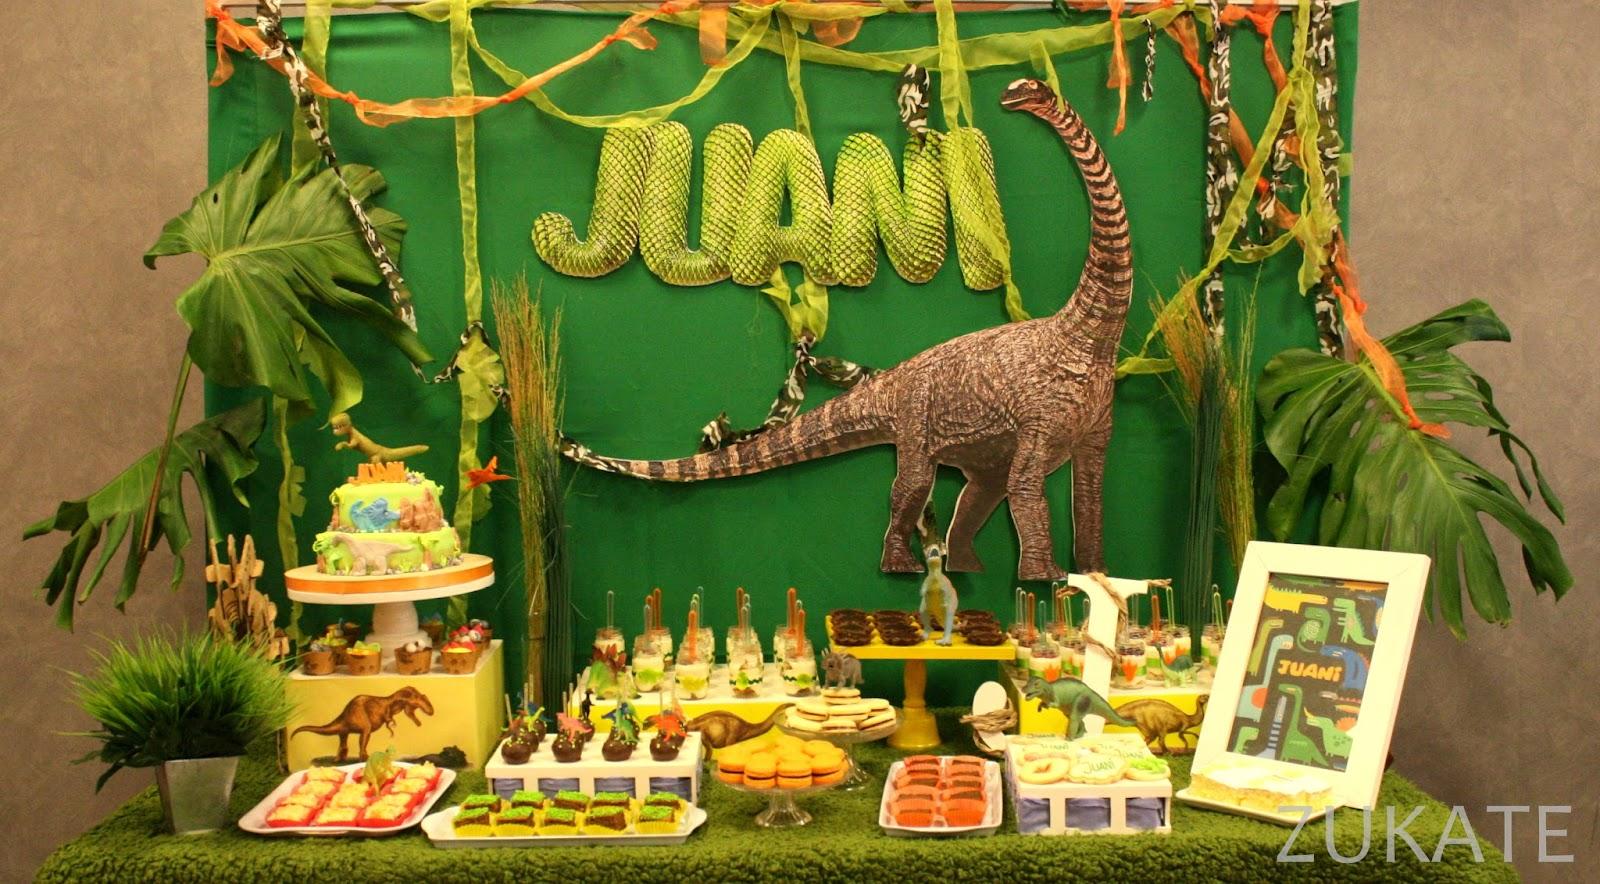 Fiesta de dinosaurios para juani zukate - Decoracion de fiestas de cumpleanos infantiles ...